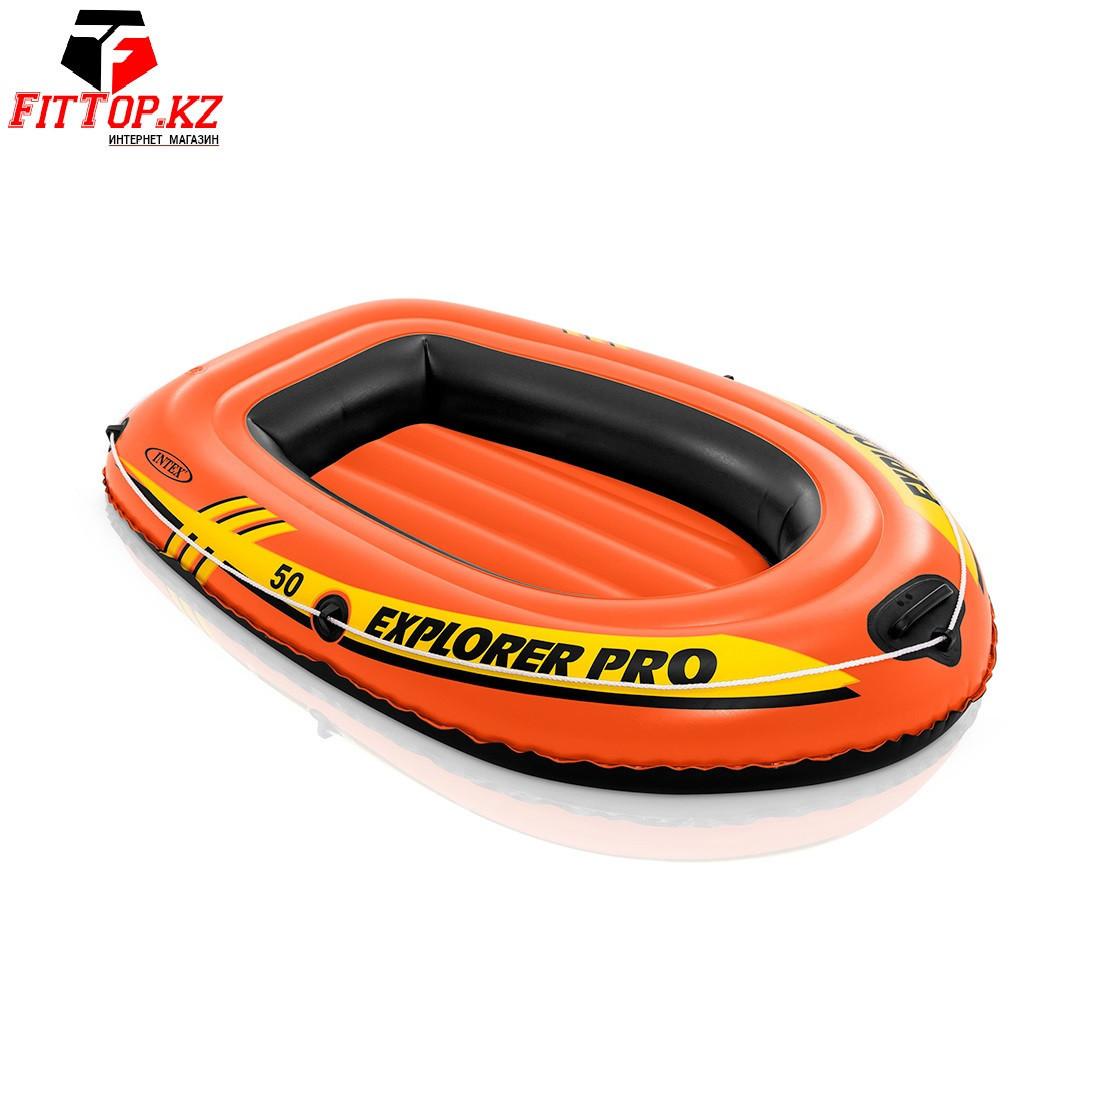 Лодка надувная Exlorer PRO 200 (196 х 102 см), INTEX 58356NP